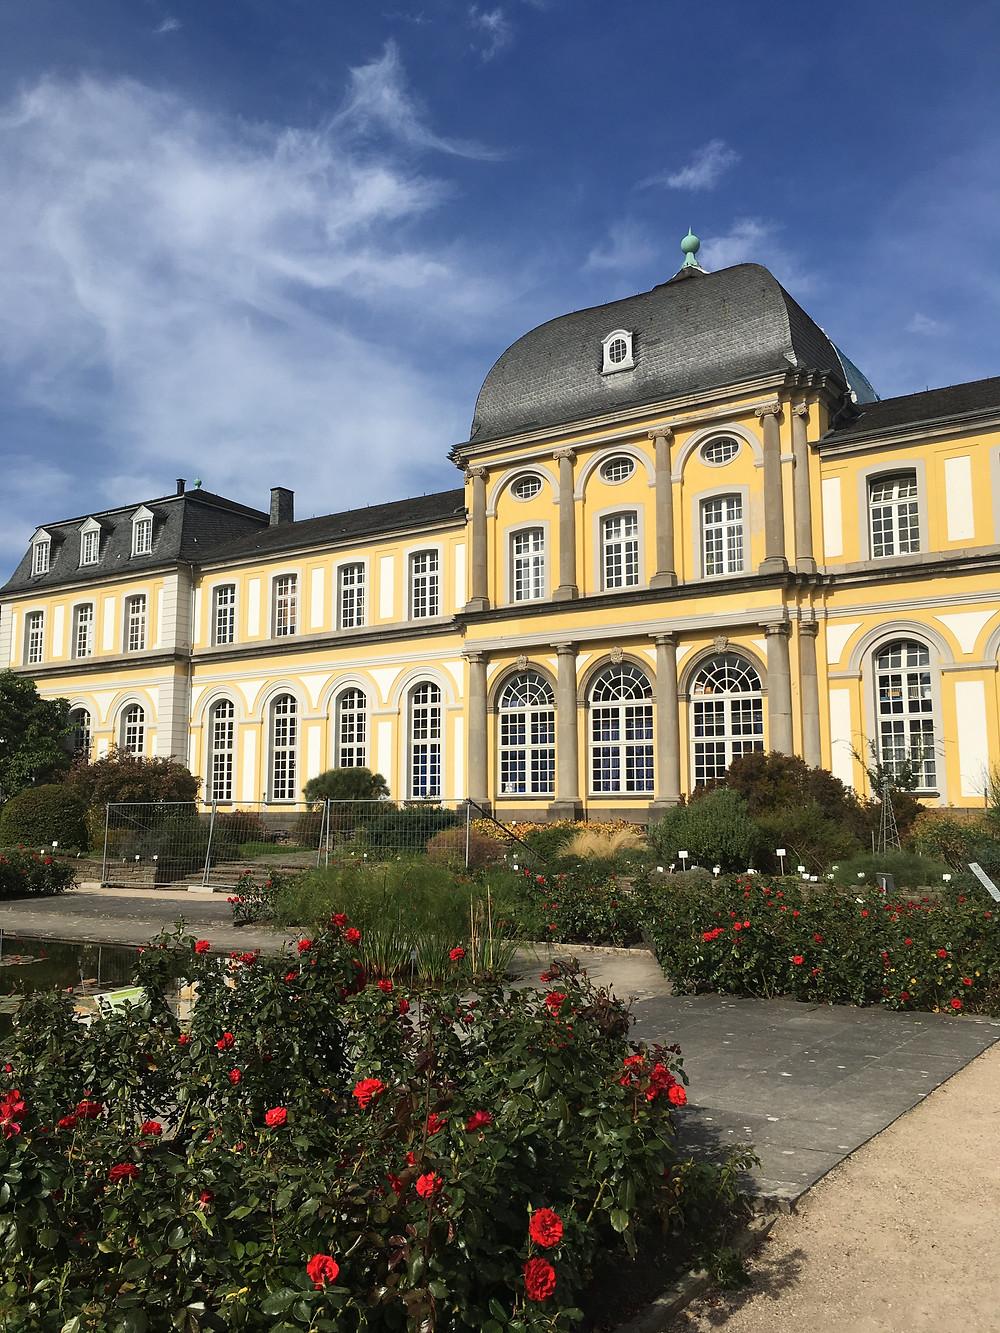 Popplesdorf Schloss - Image by C. Venery